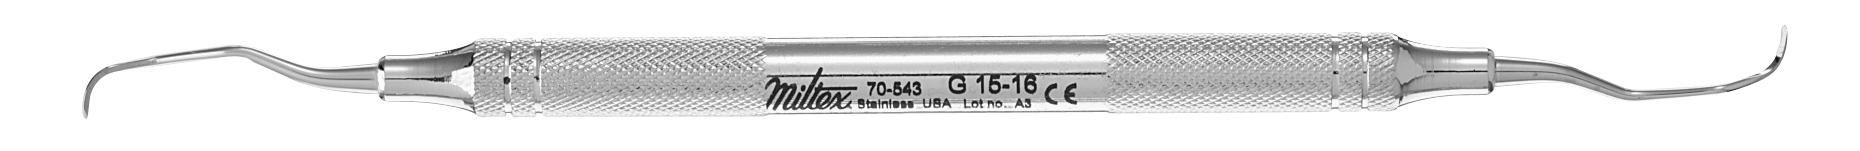 gracey-13-14-rigid-curette-4-70-542r-miltex.jpg